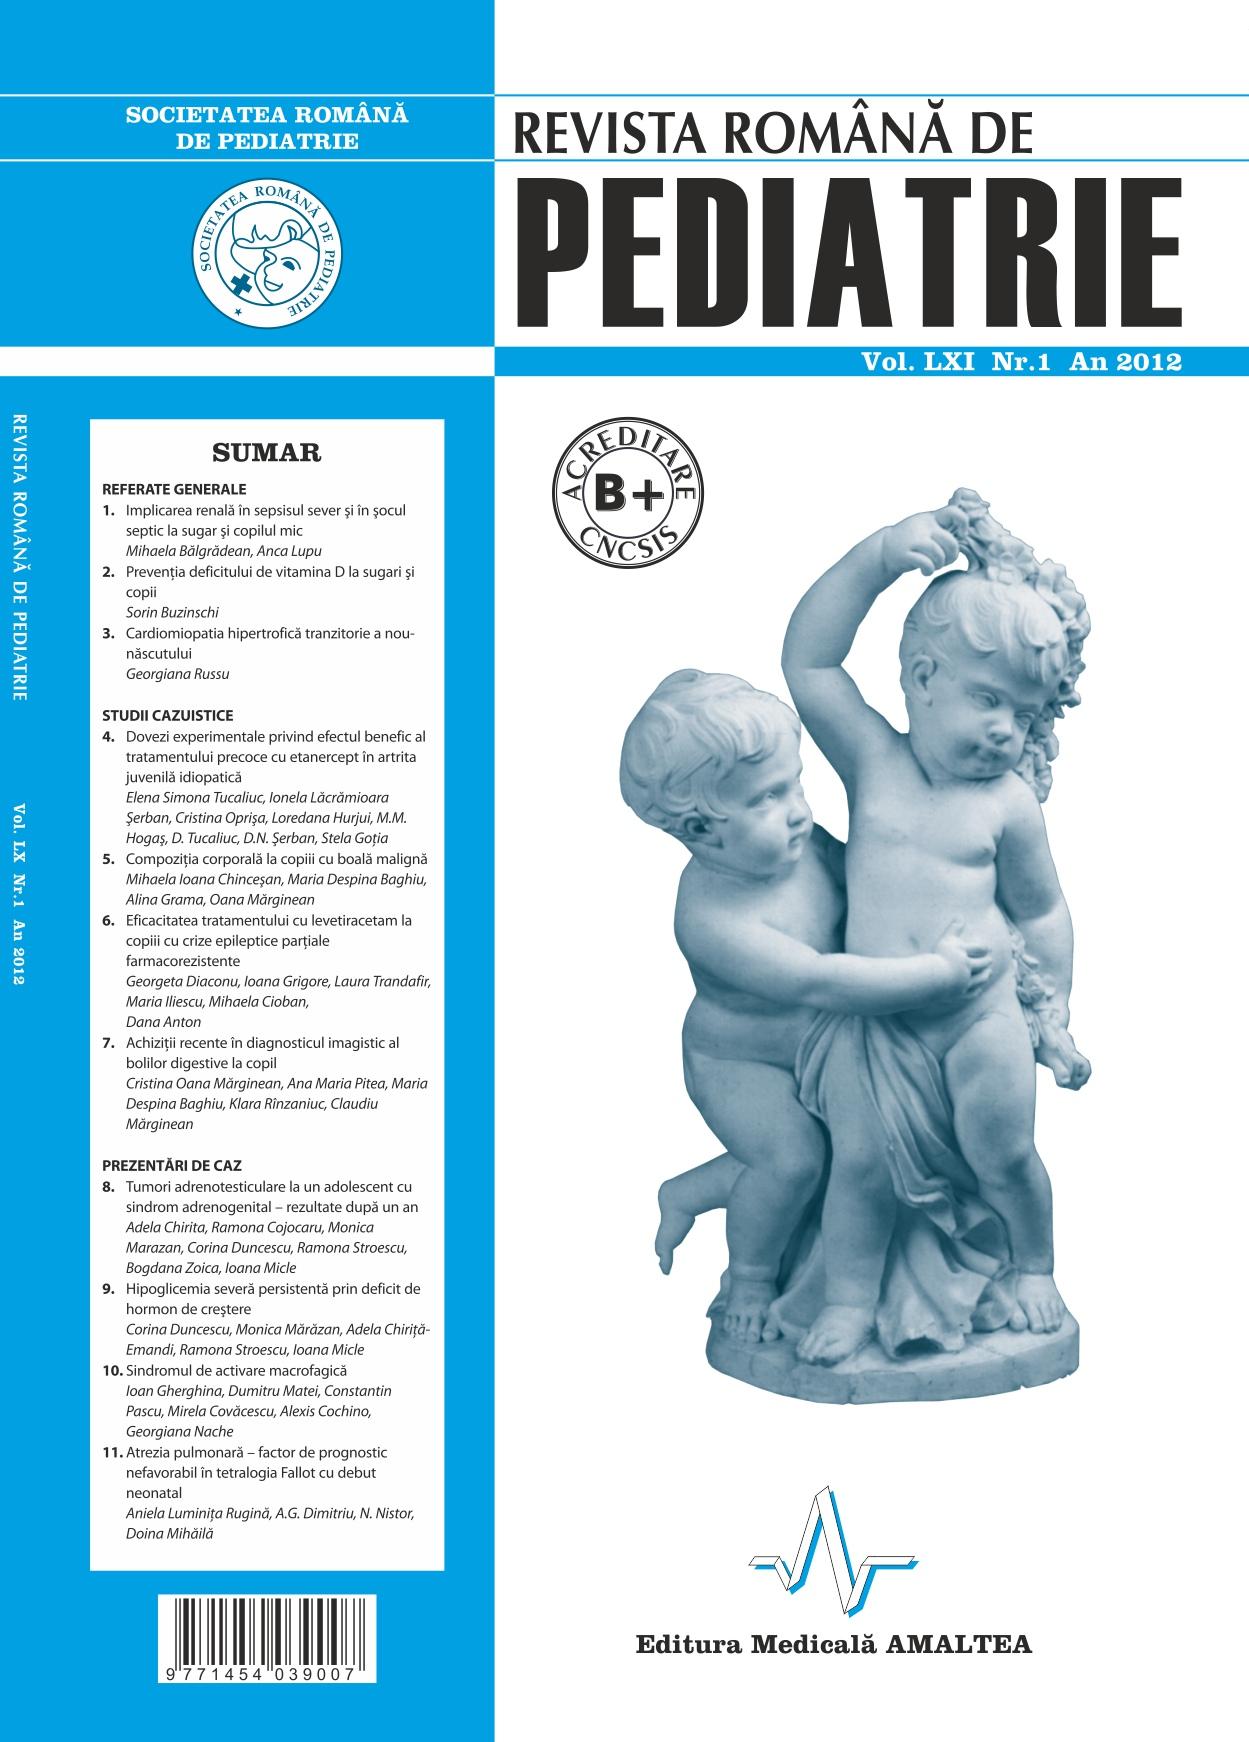 Revista Romana de PEDIATRIE | Volumul LXI, No. 1, Year 2012